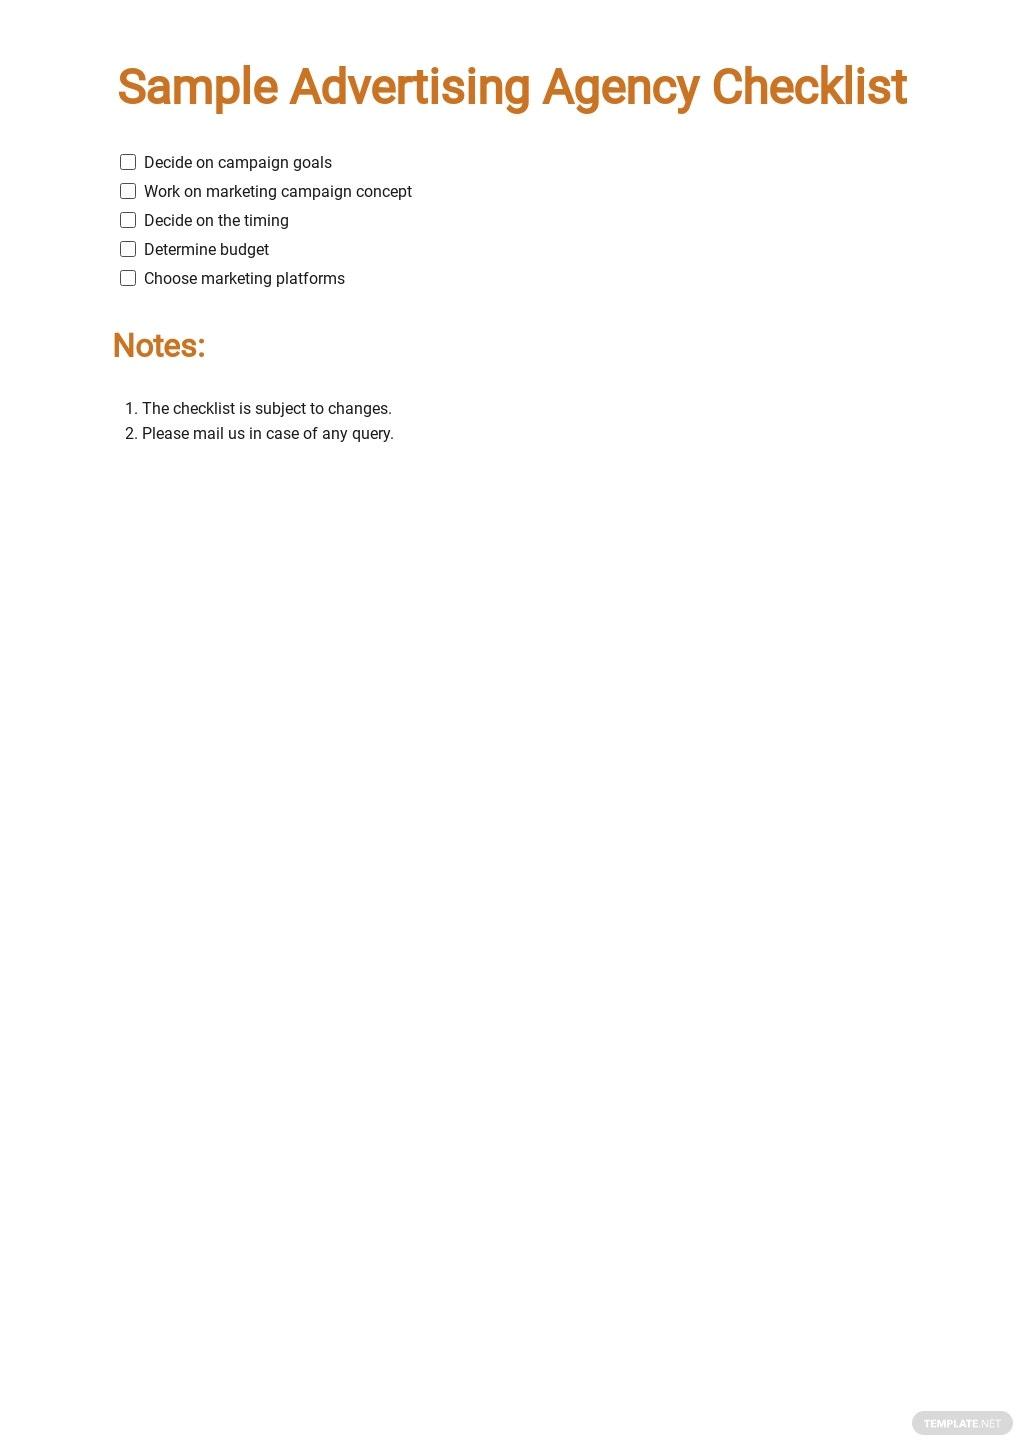 Sample Advertising Agency Checklist Template